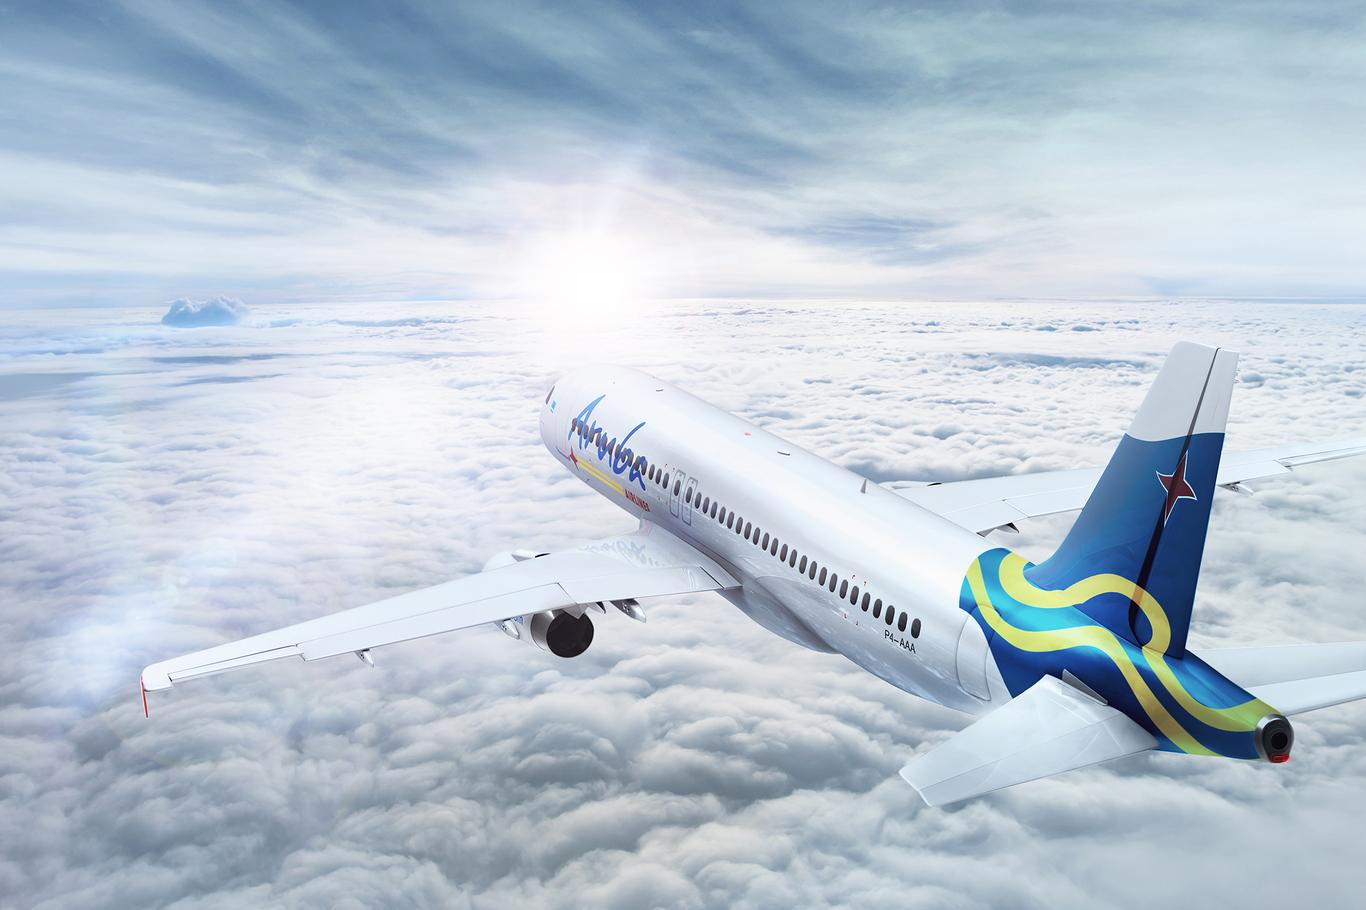 Tacorco aruba airlines 1 a31f183b 2fqh